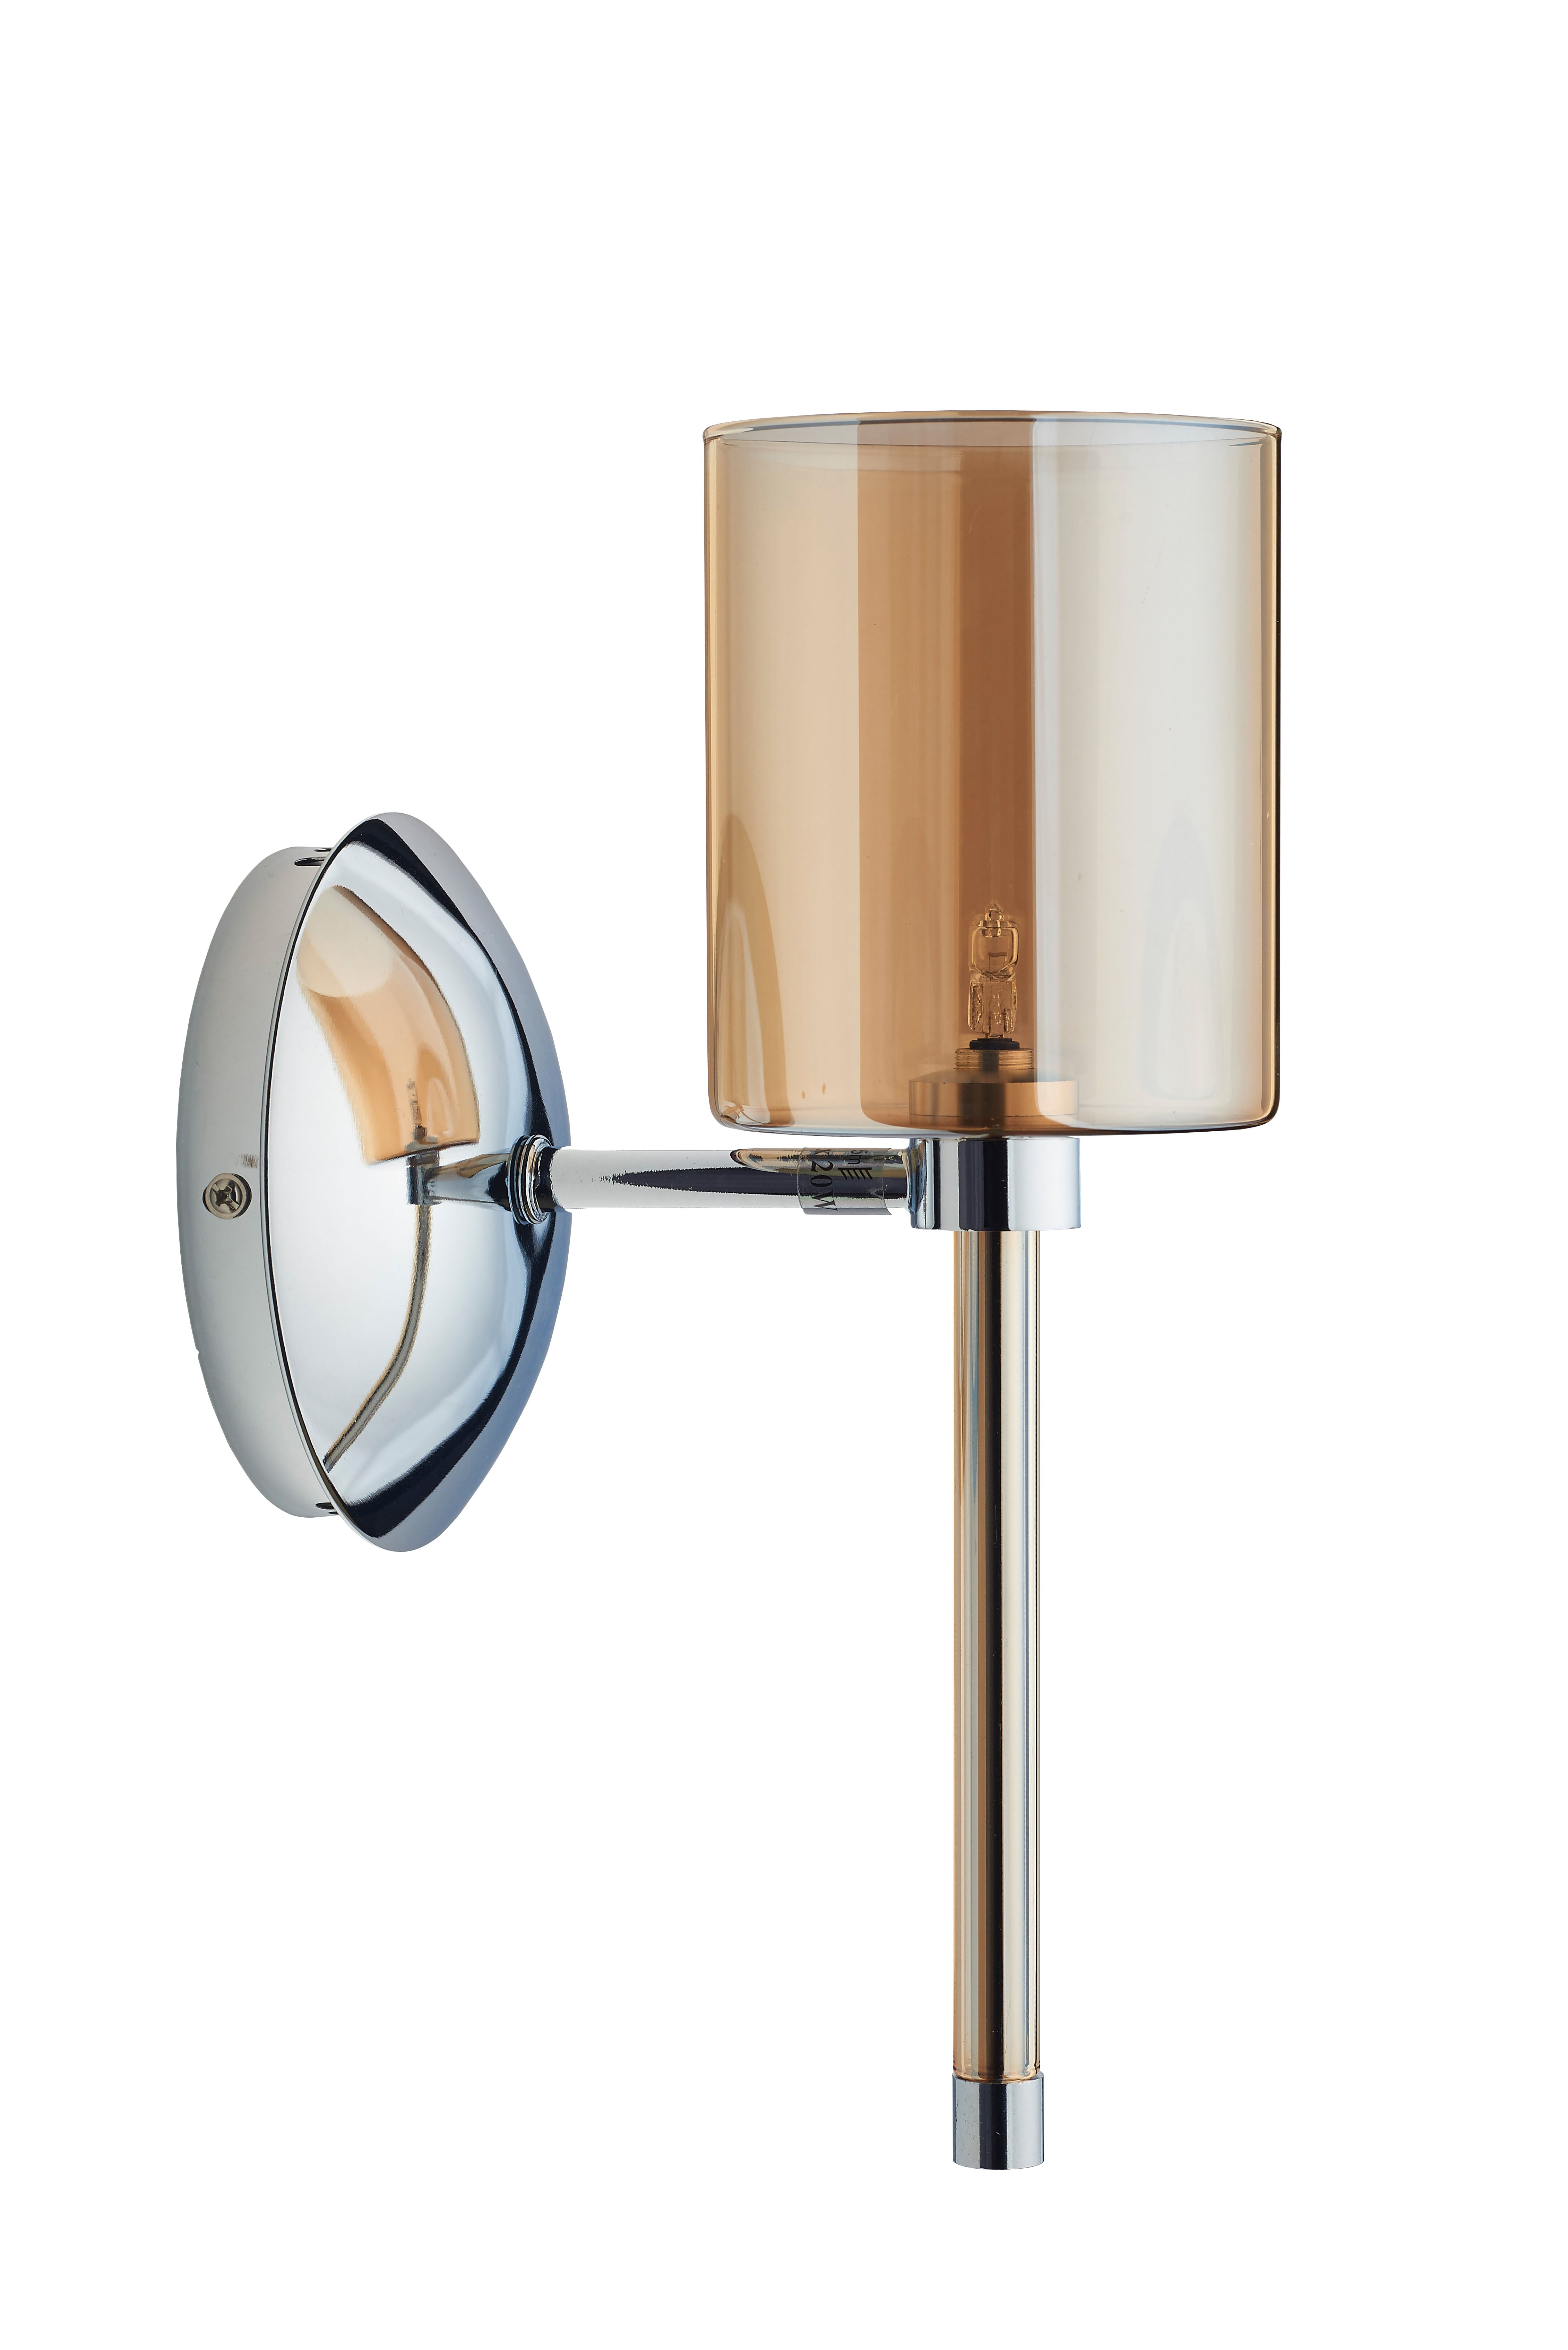 Modernismus Flaconetta chrom / Champagne G4 20W